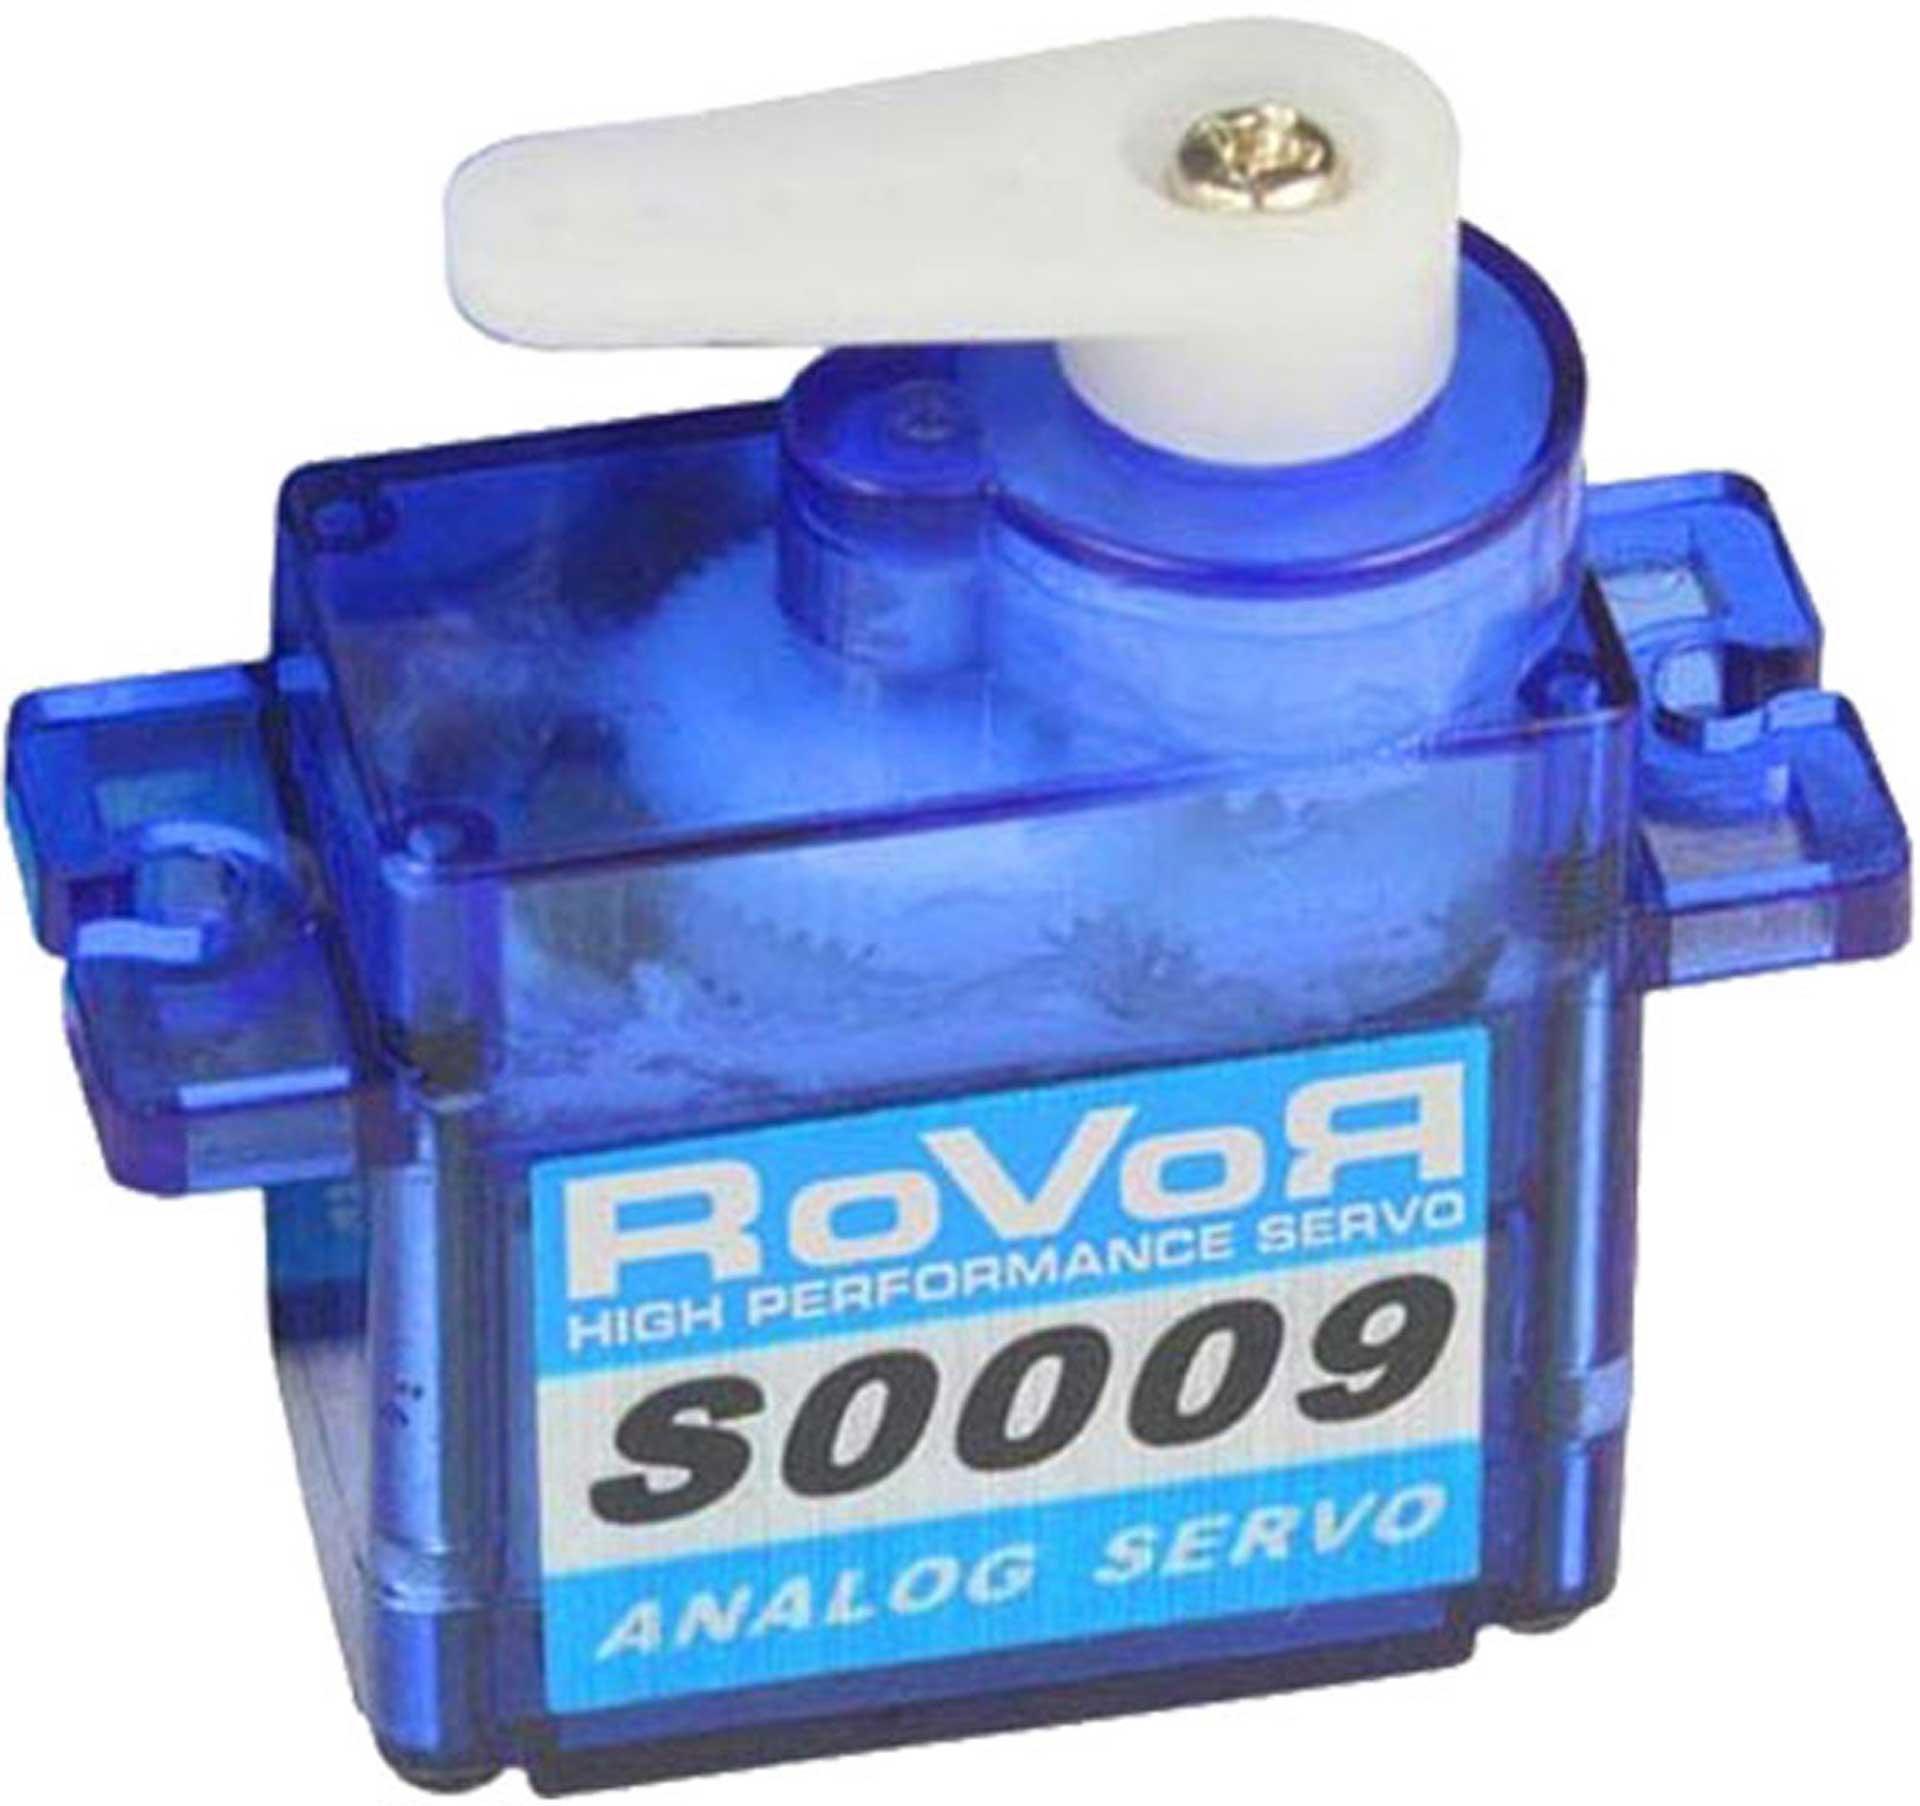 Robbe Modellsport ROVOR SERVO S0009 9G